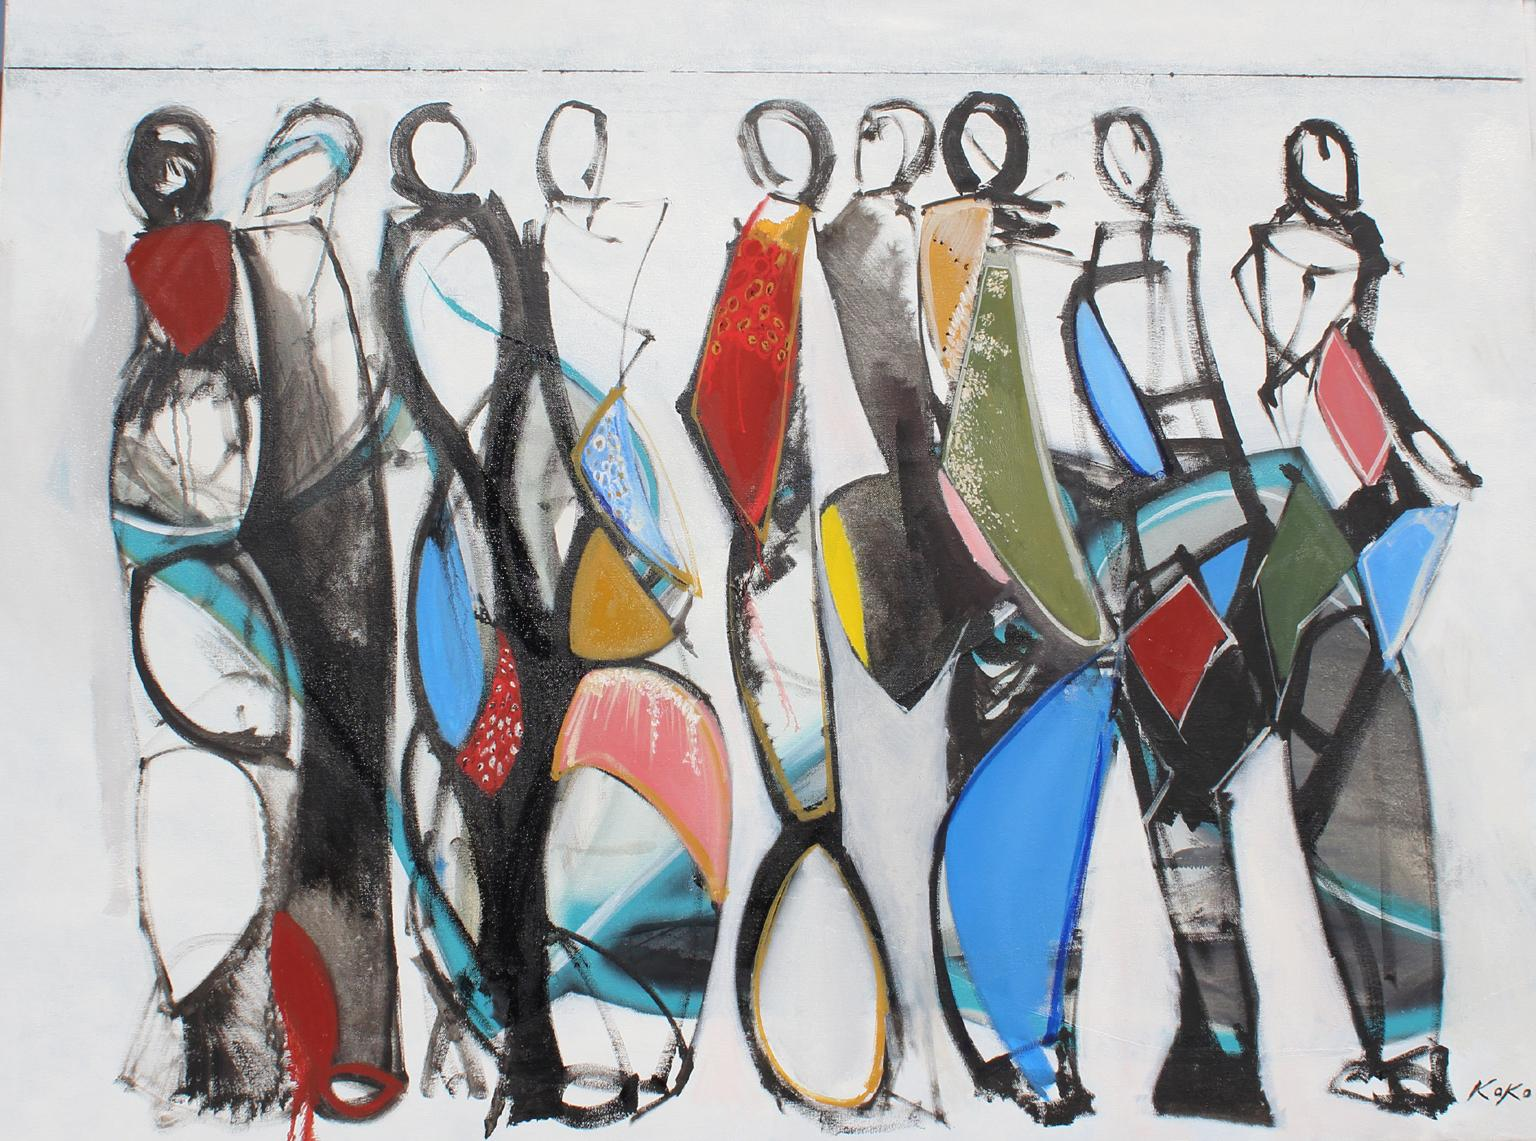 9 geometric figures